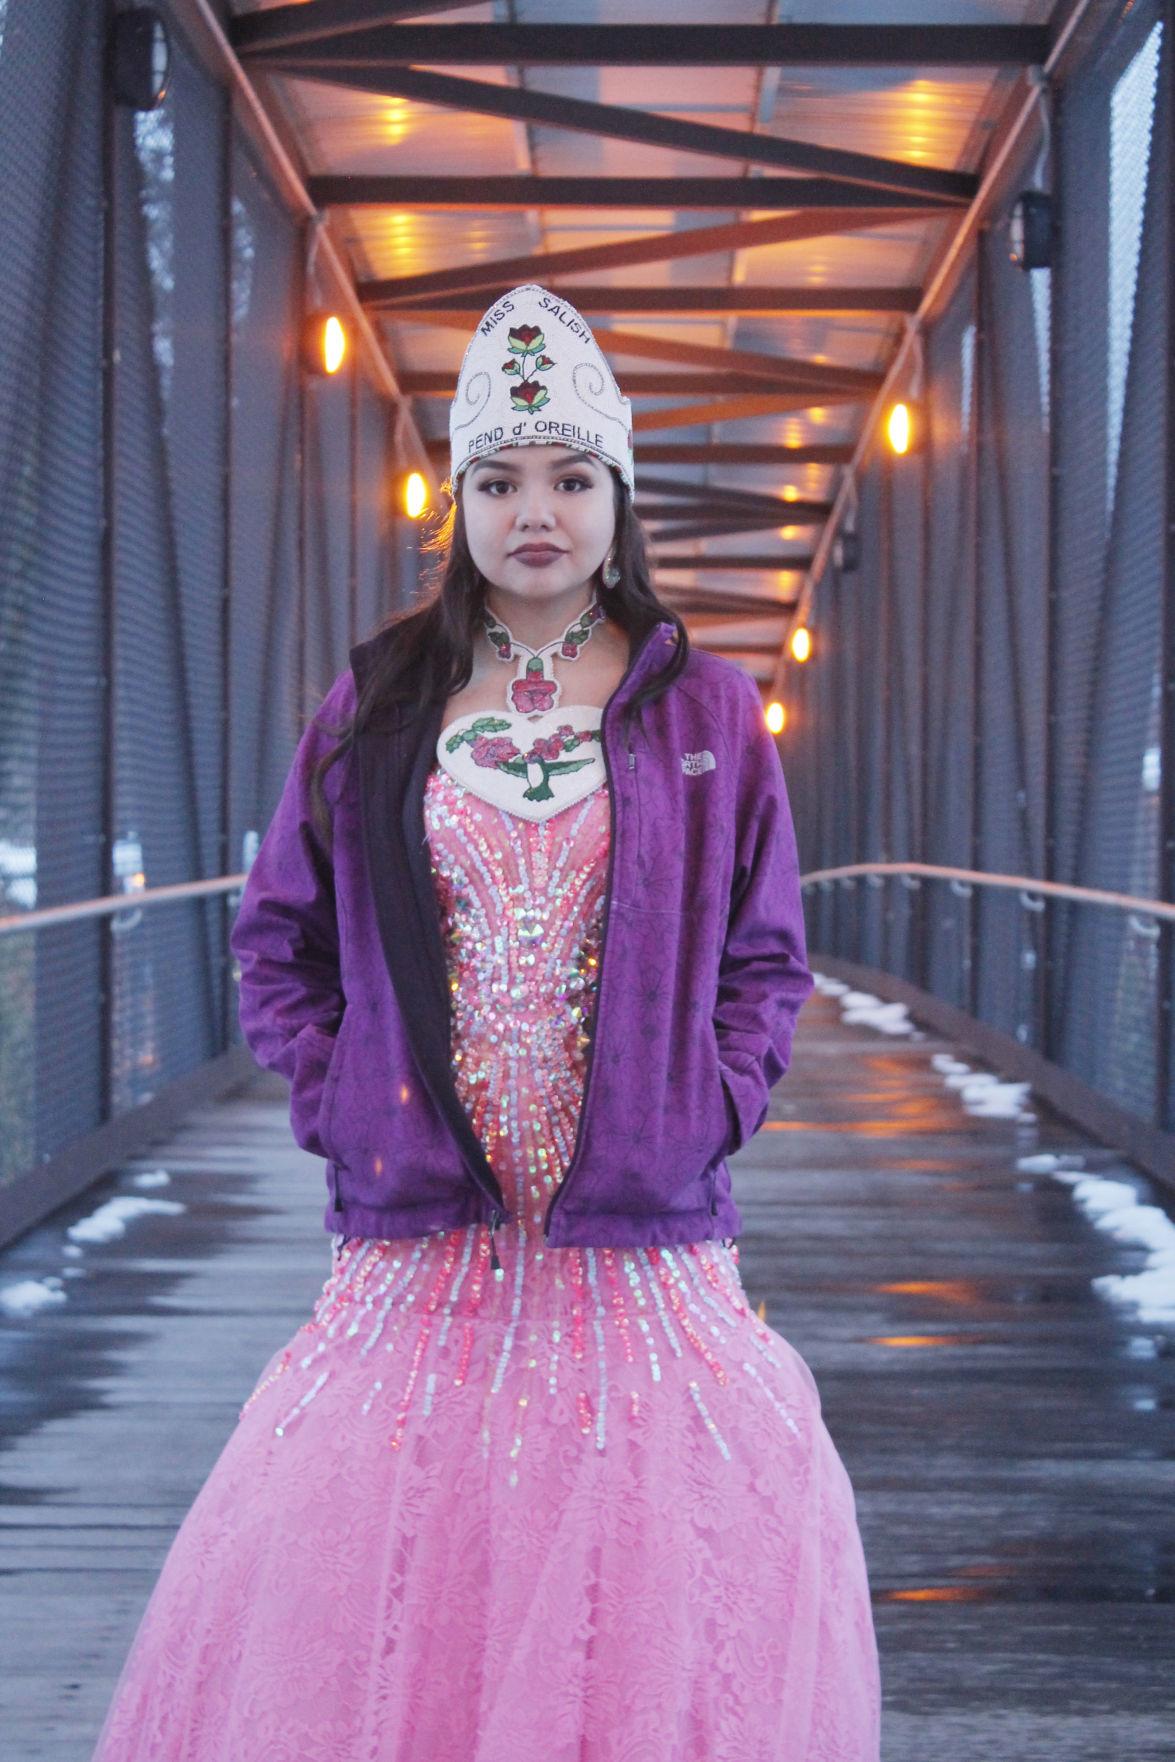 'Pink Dress Project'